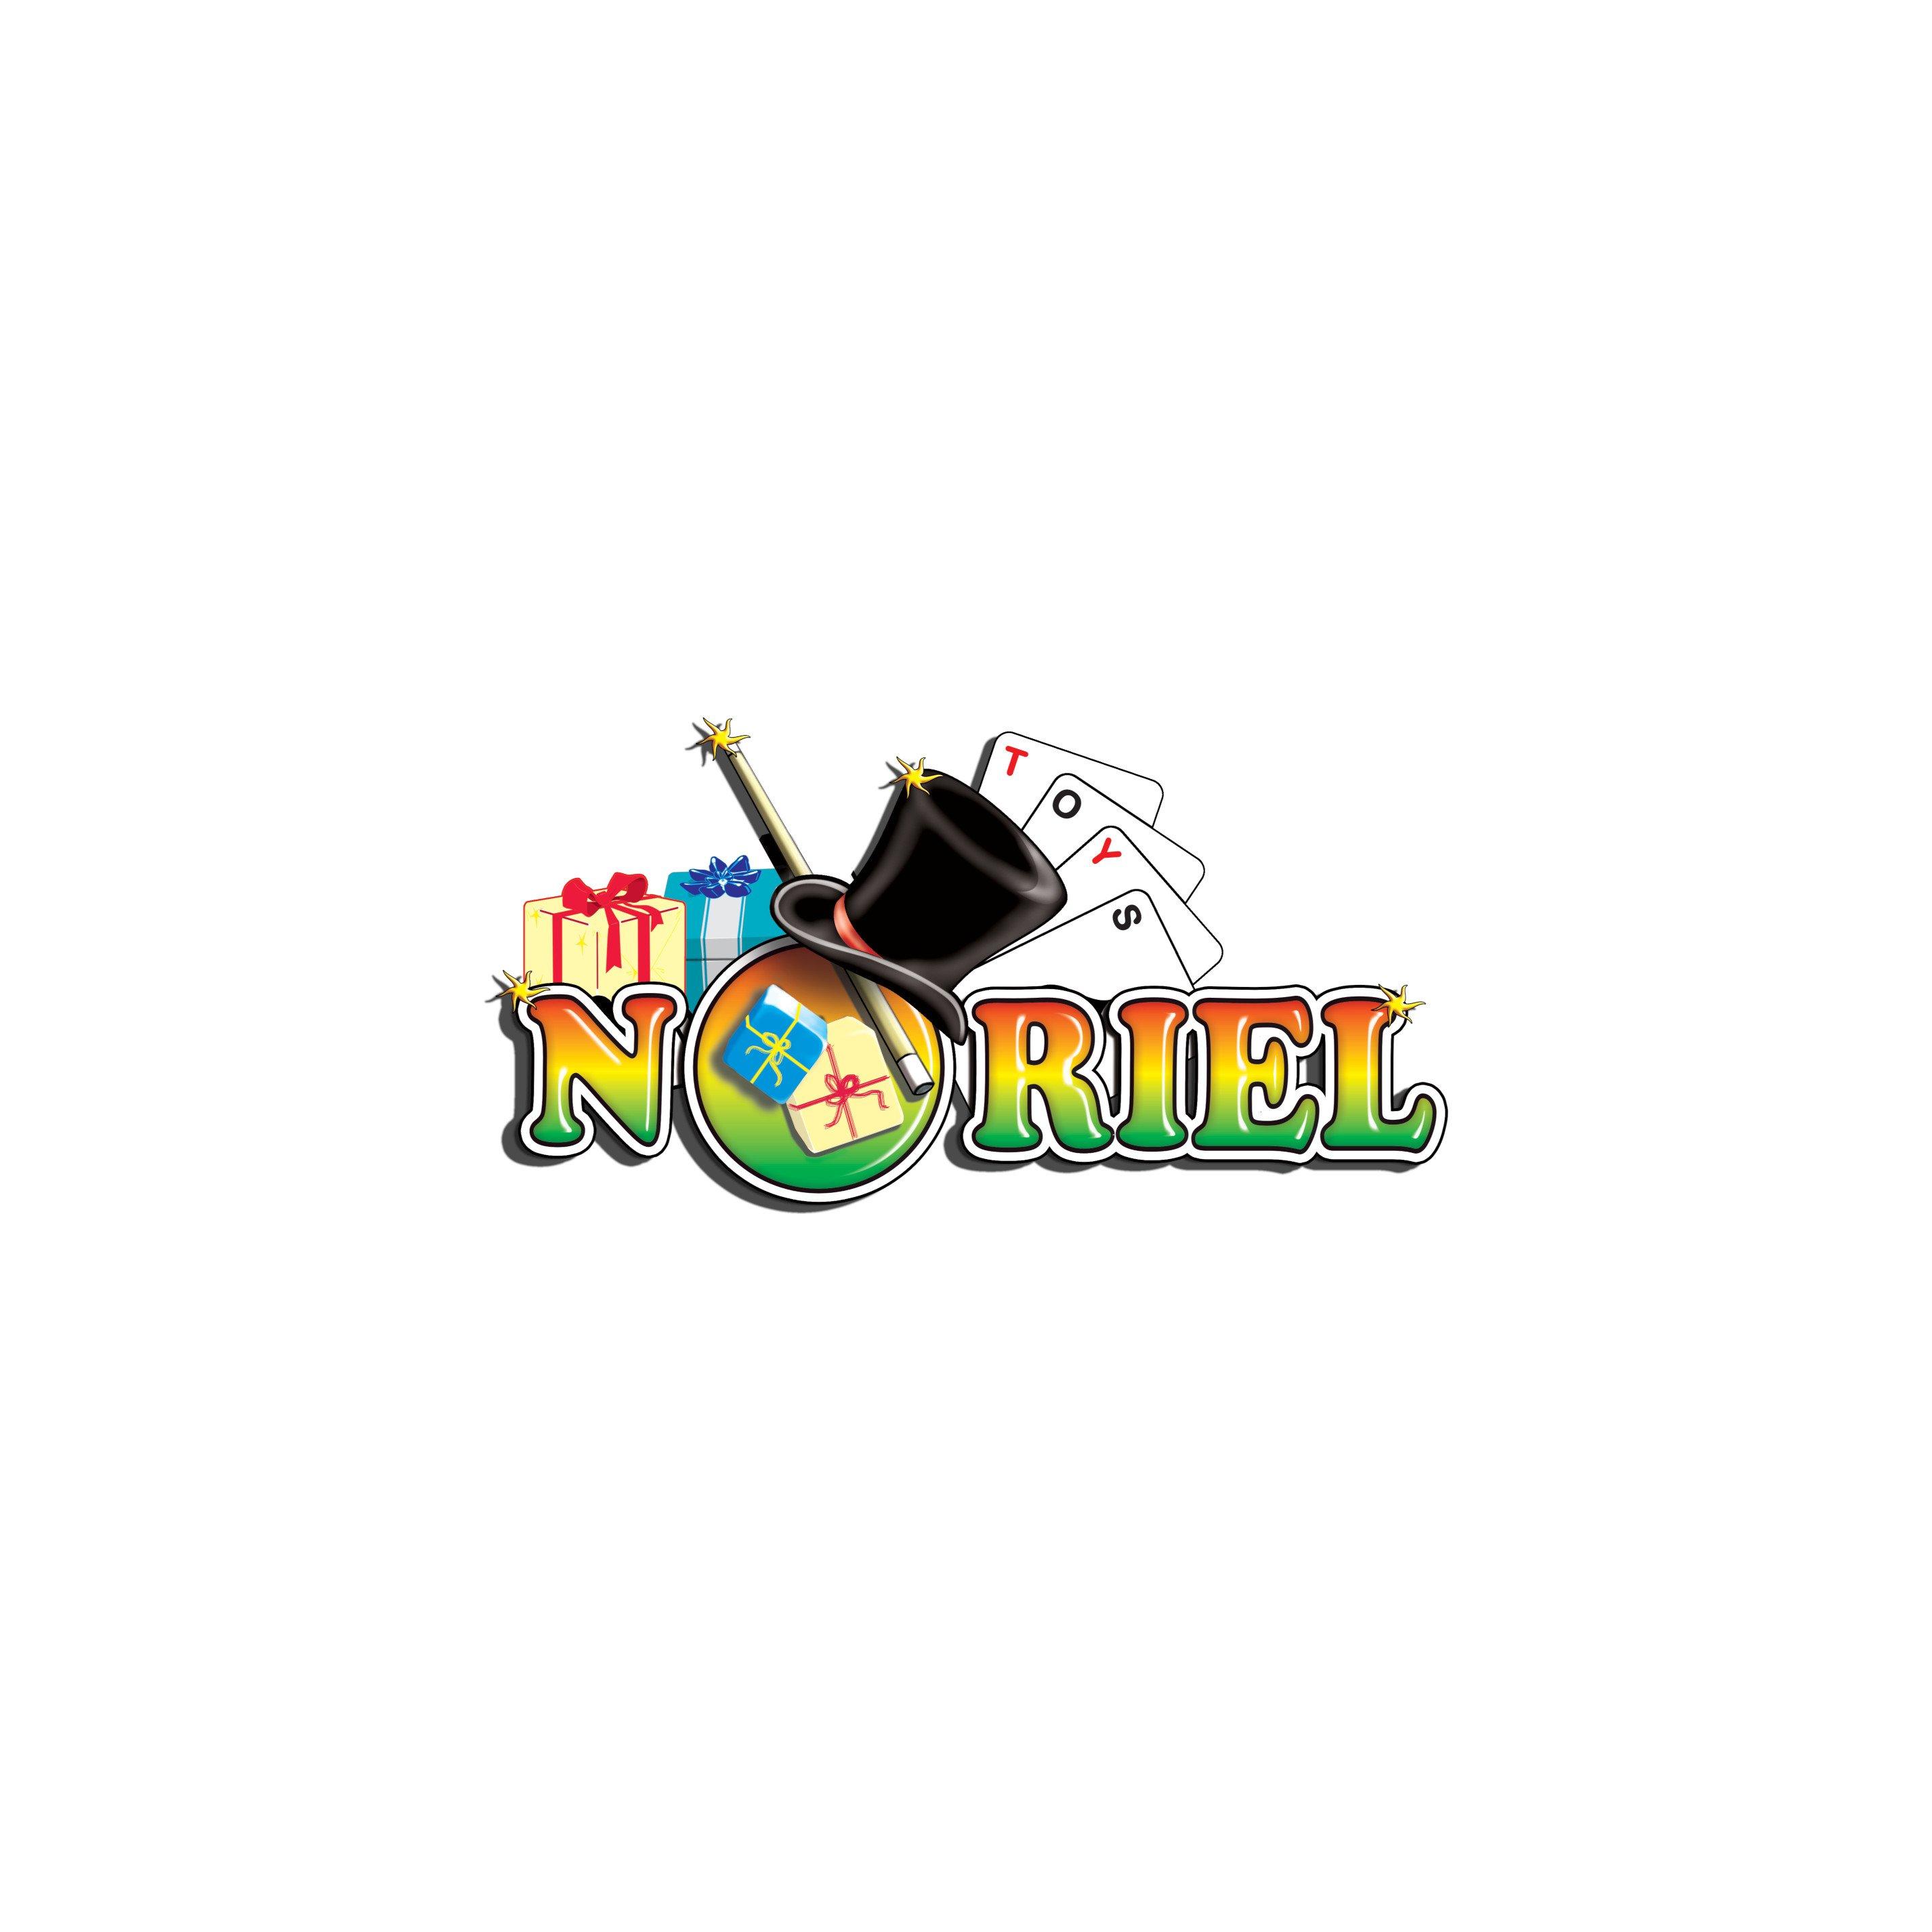 Ansamblu de joaca pentru copii 4 in 1 Dolu imagine